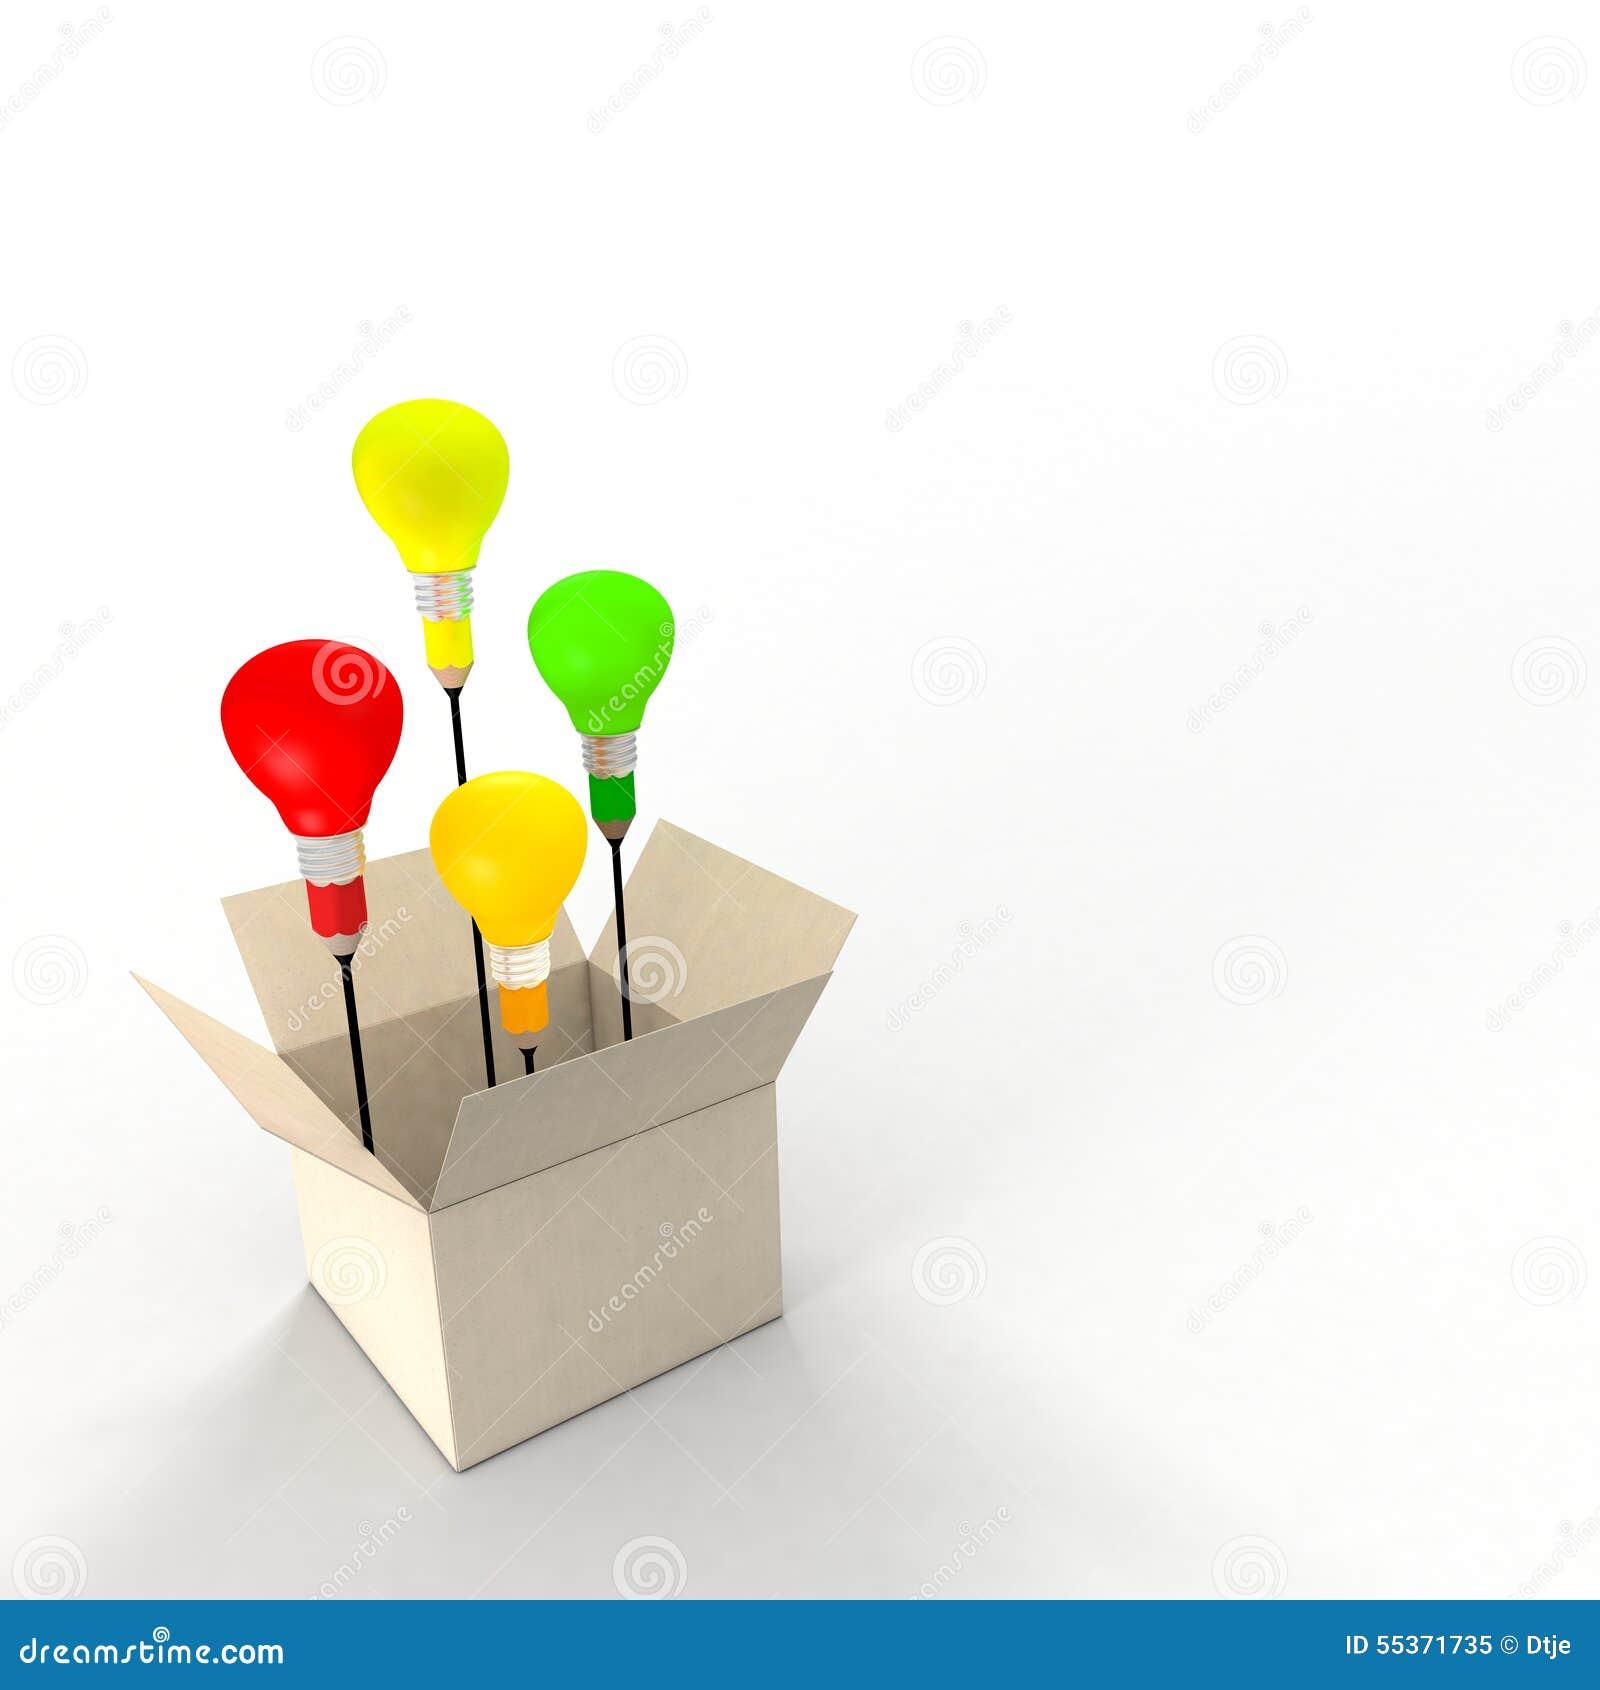 Several Ideas Emerging From An Idea Box Metaphor Concept